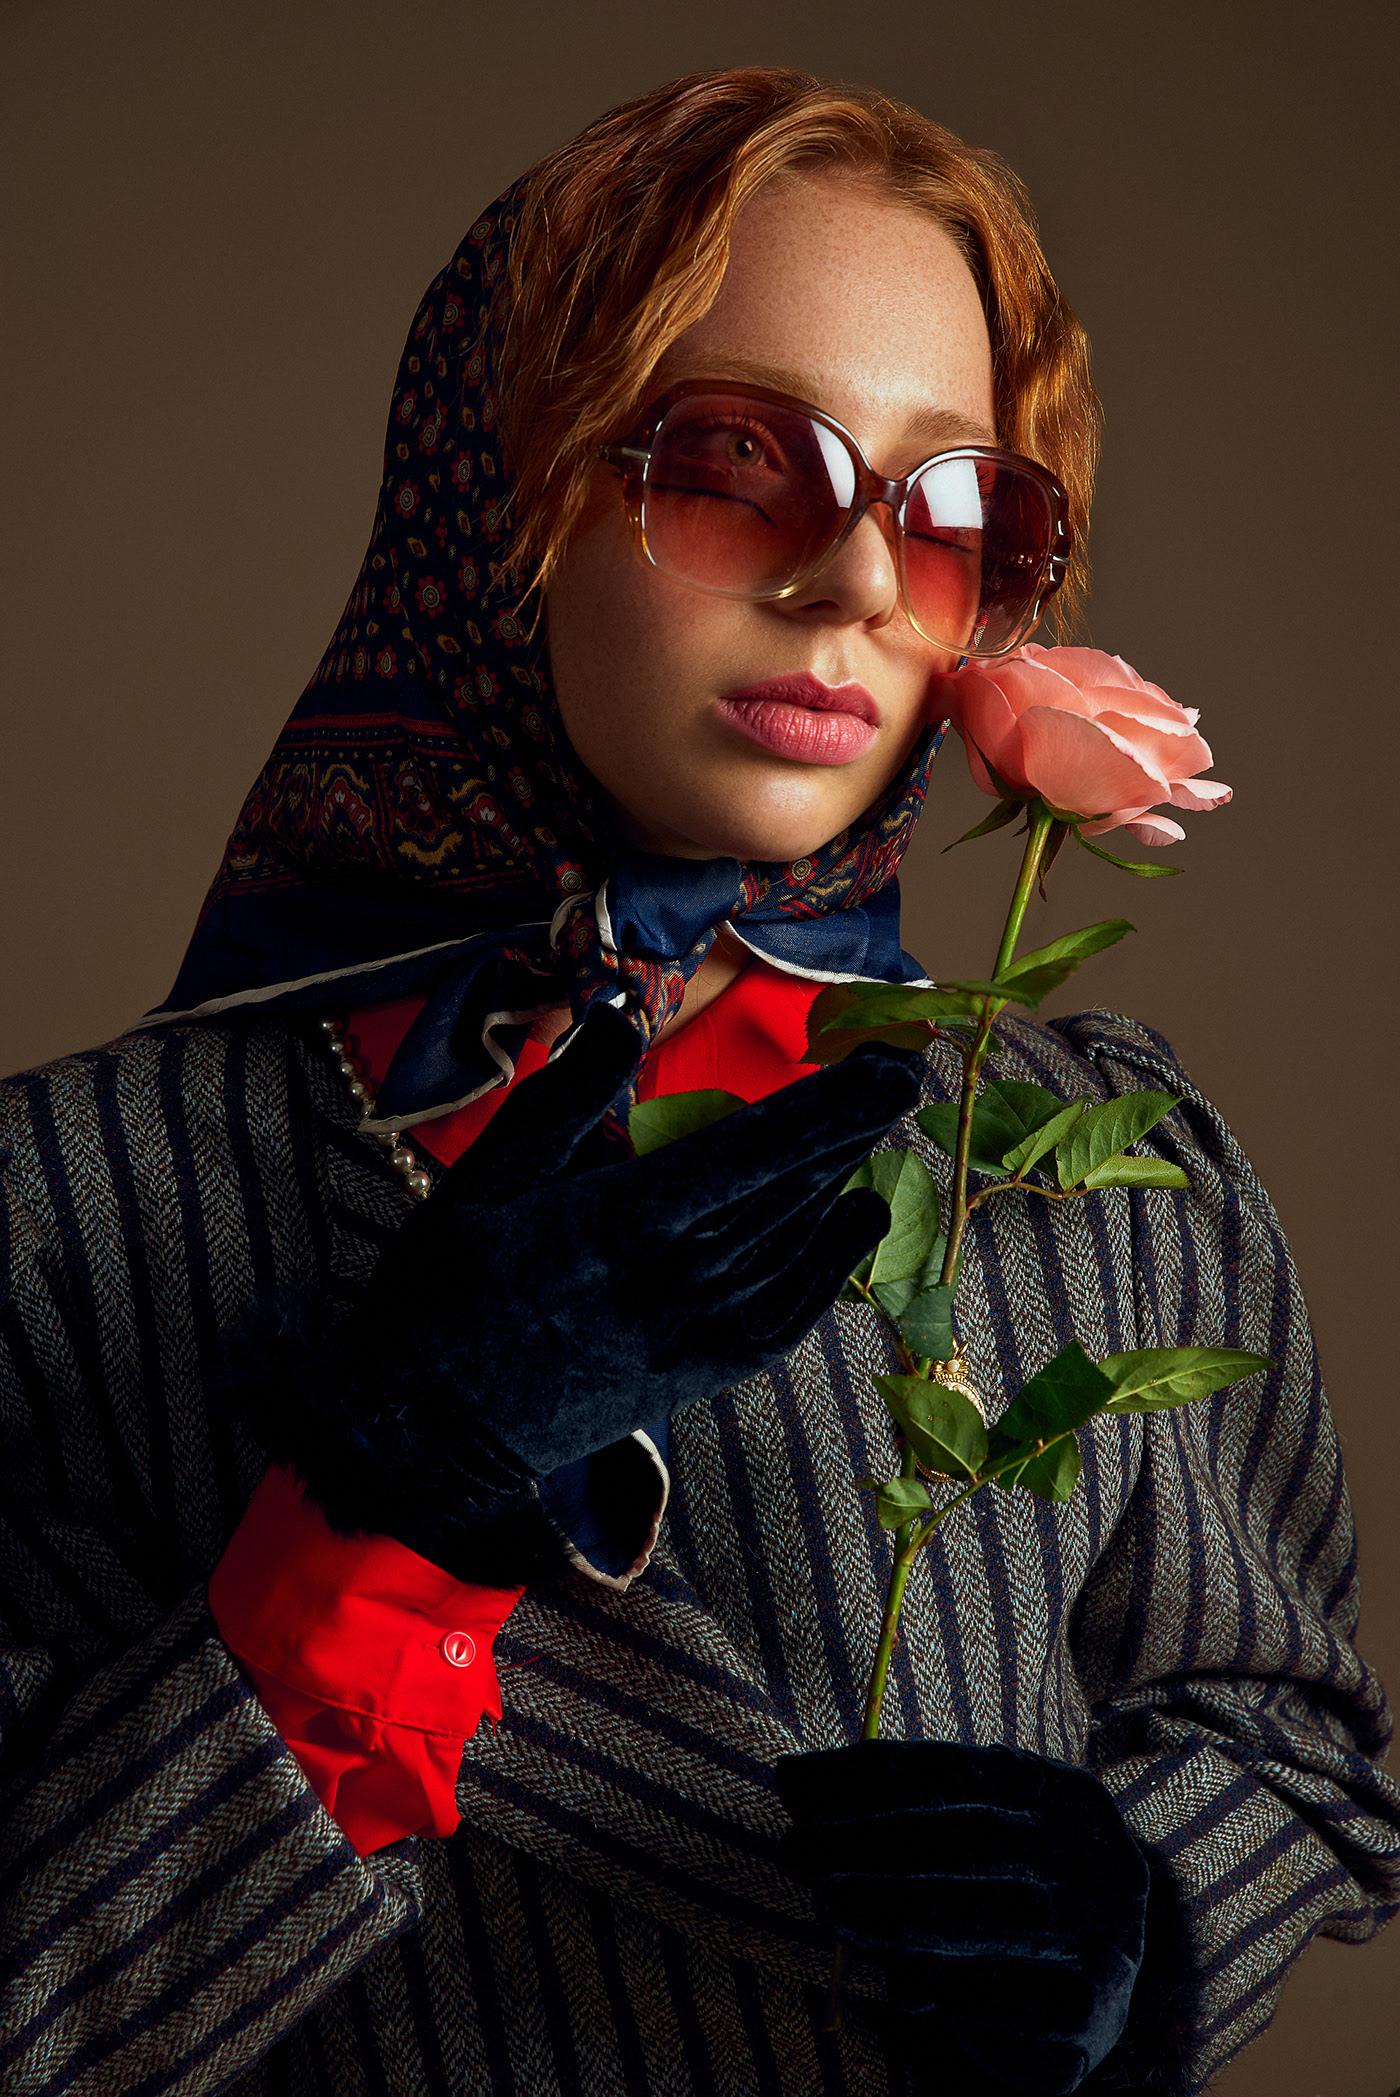 Rosie / фотограф Bruno Gentile